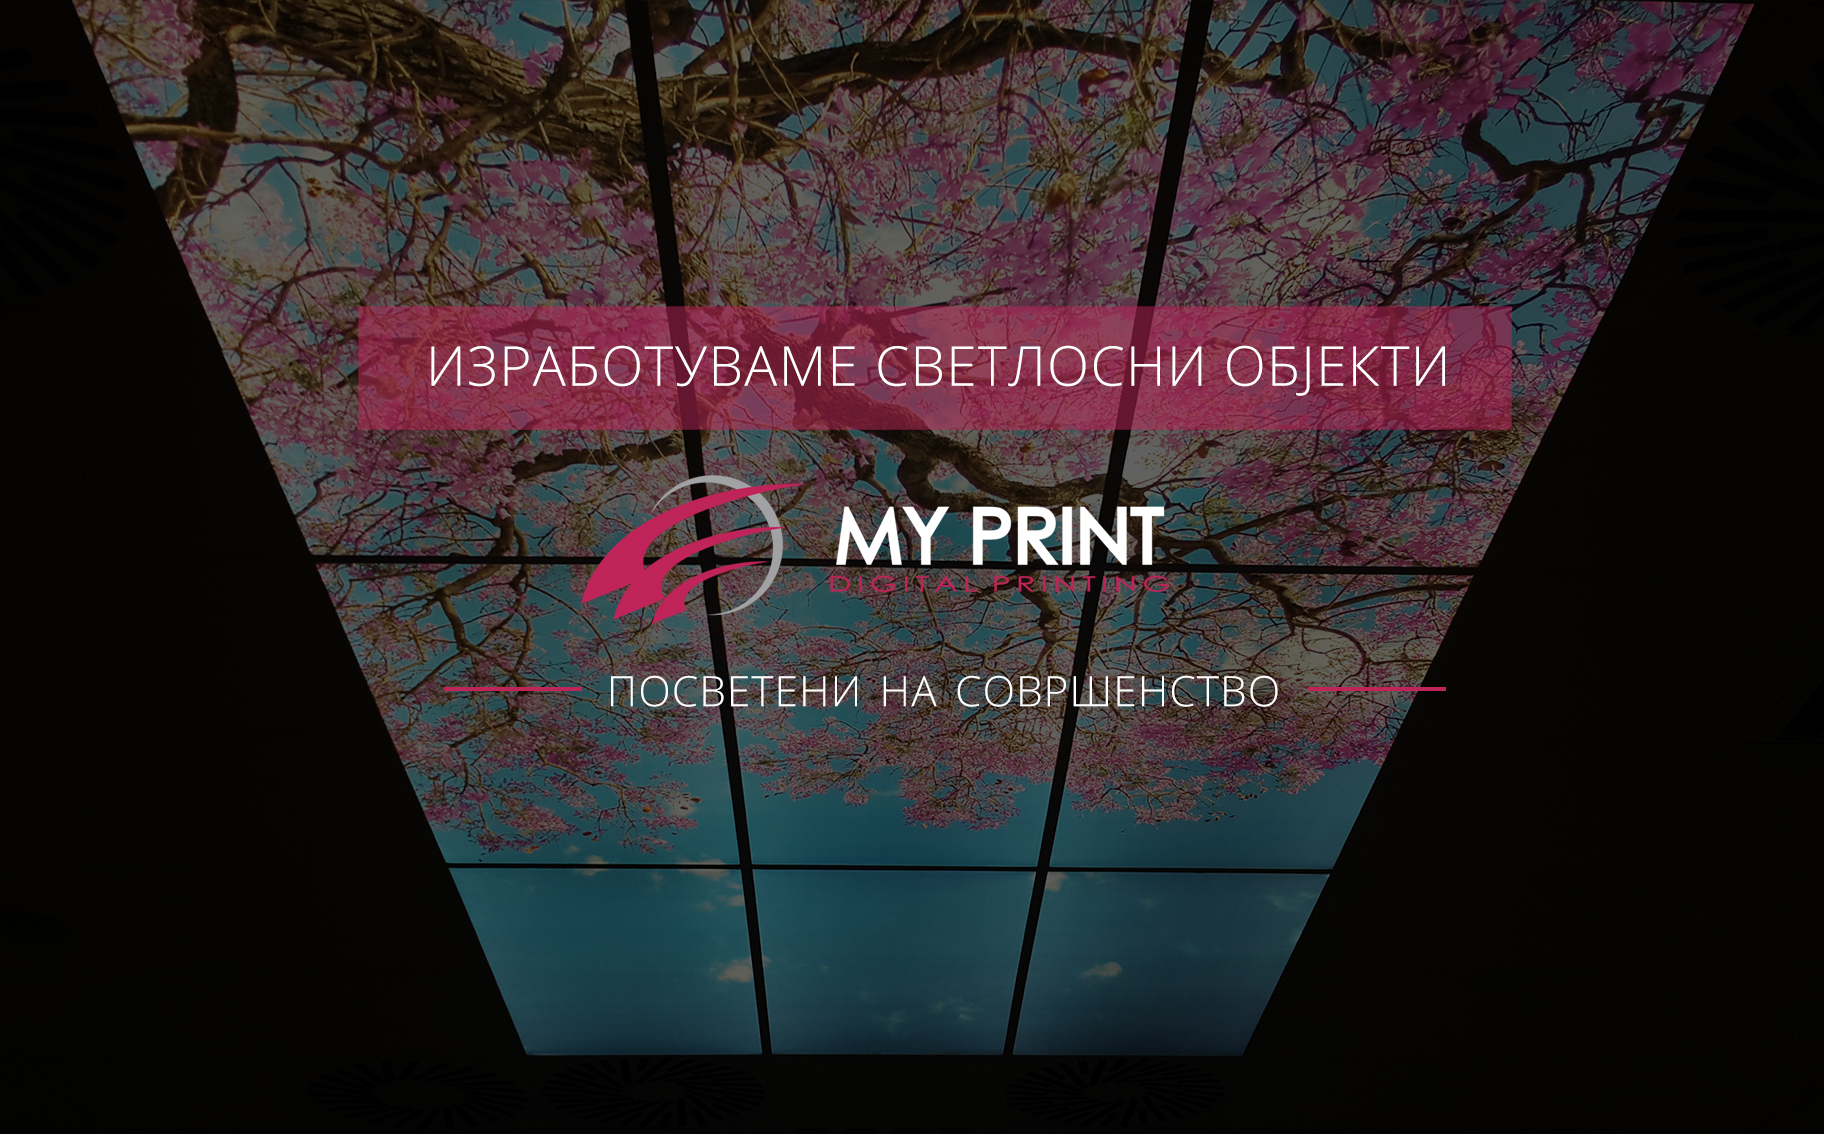 svetlosni-objekti-mk